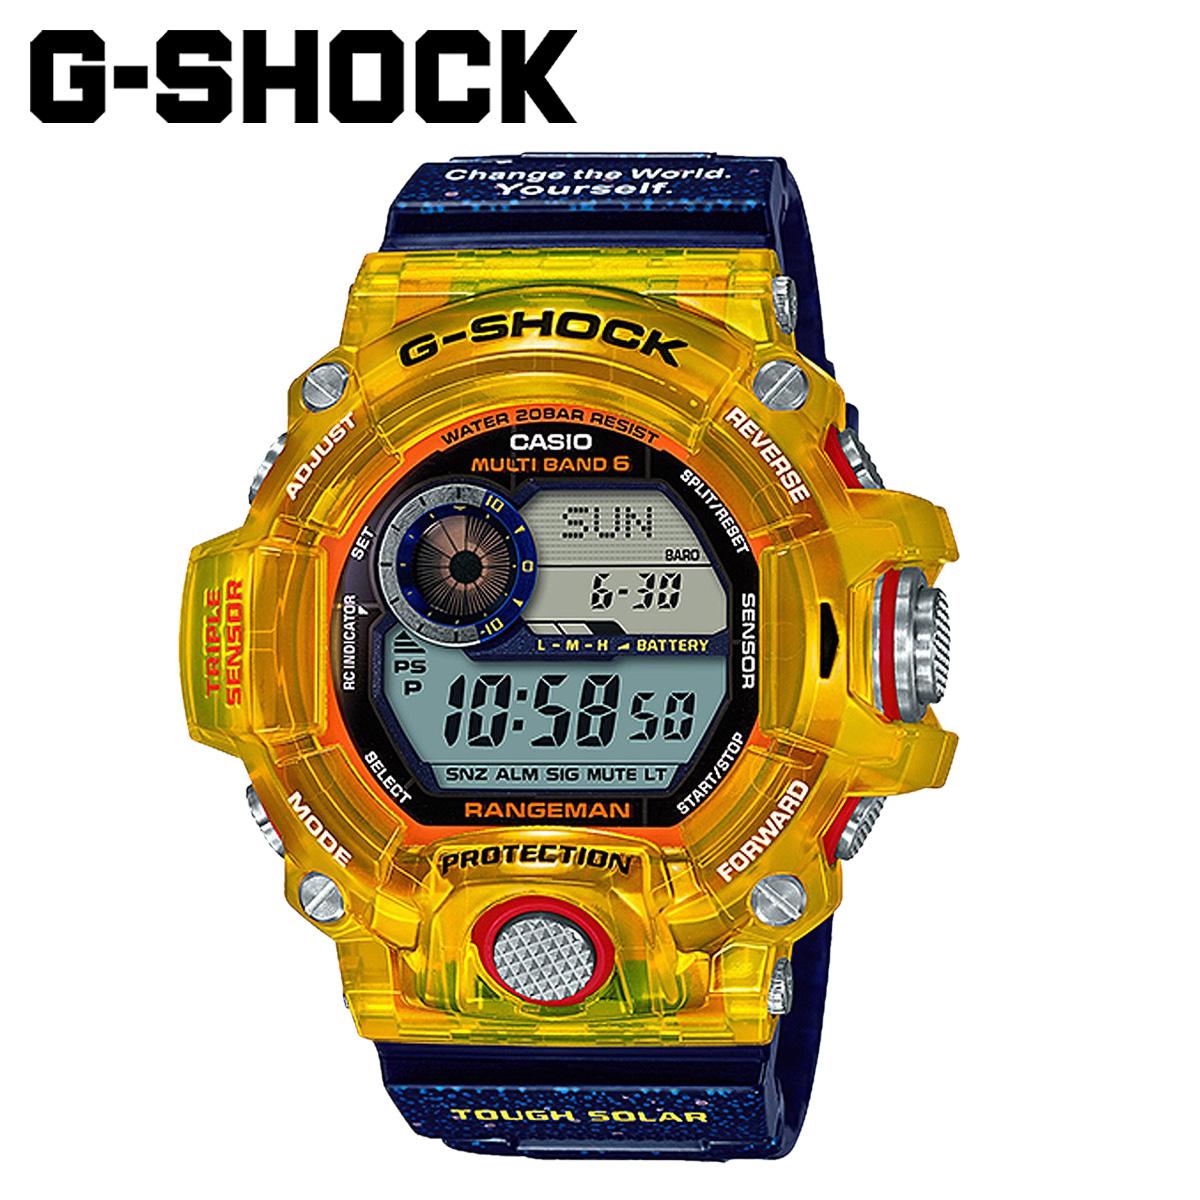 Sold Out Casio Casio G Shock Watch Gw 9403kj 9jr ジーショック G Shock G Shock Yellow Clock Men Waterproofing Limited 7 11 Reentry Load 177